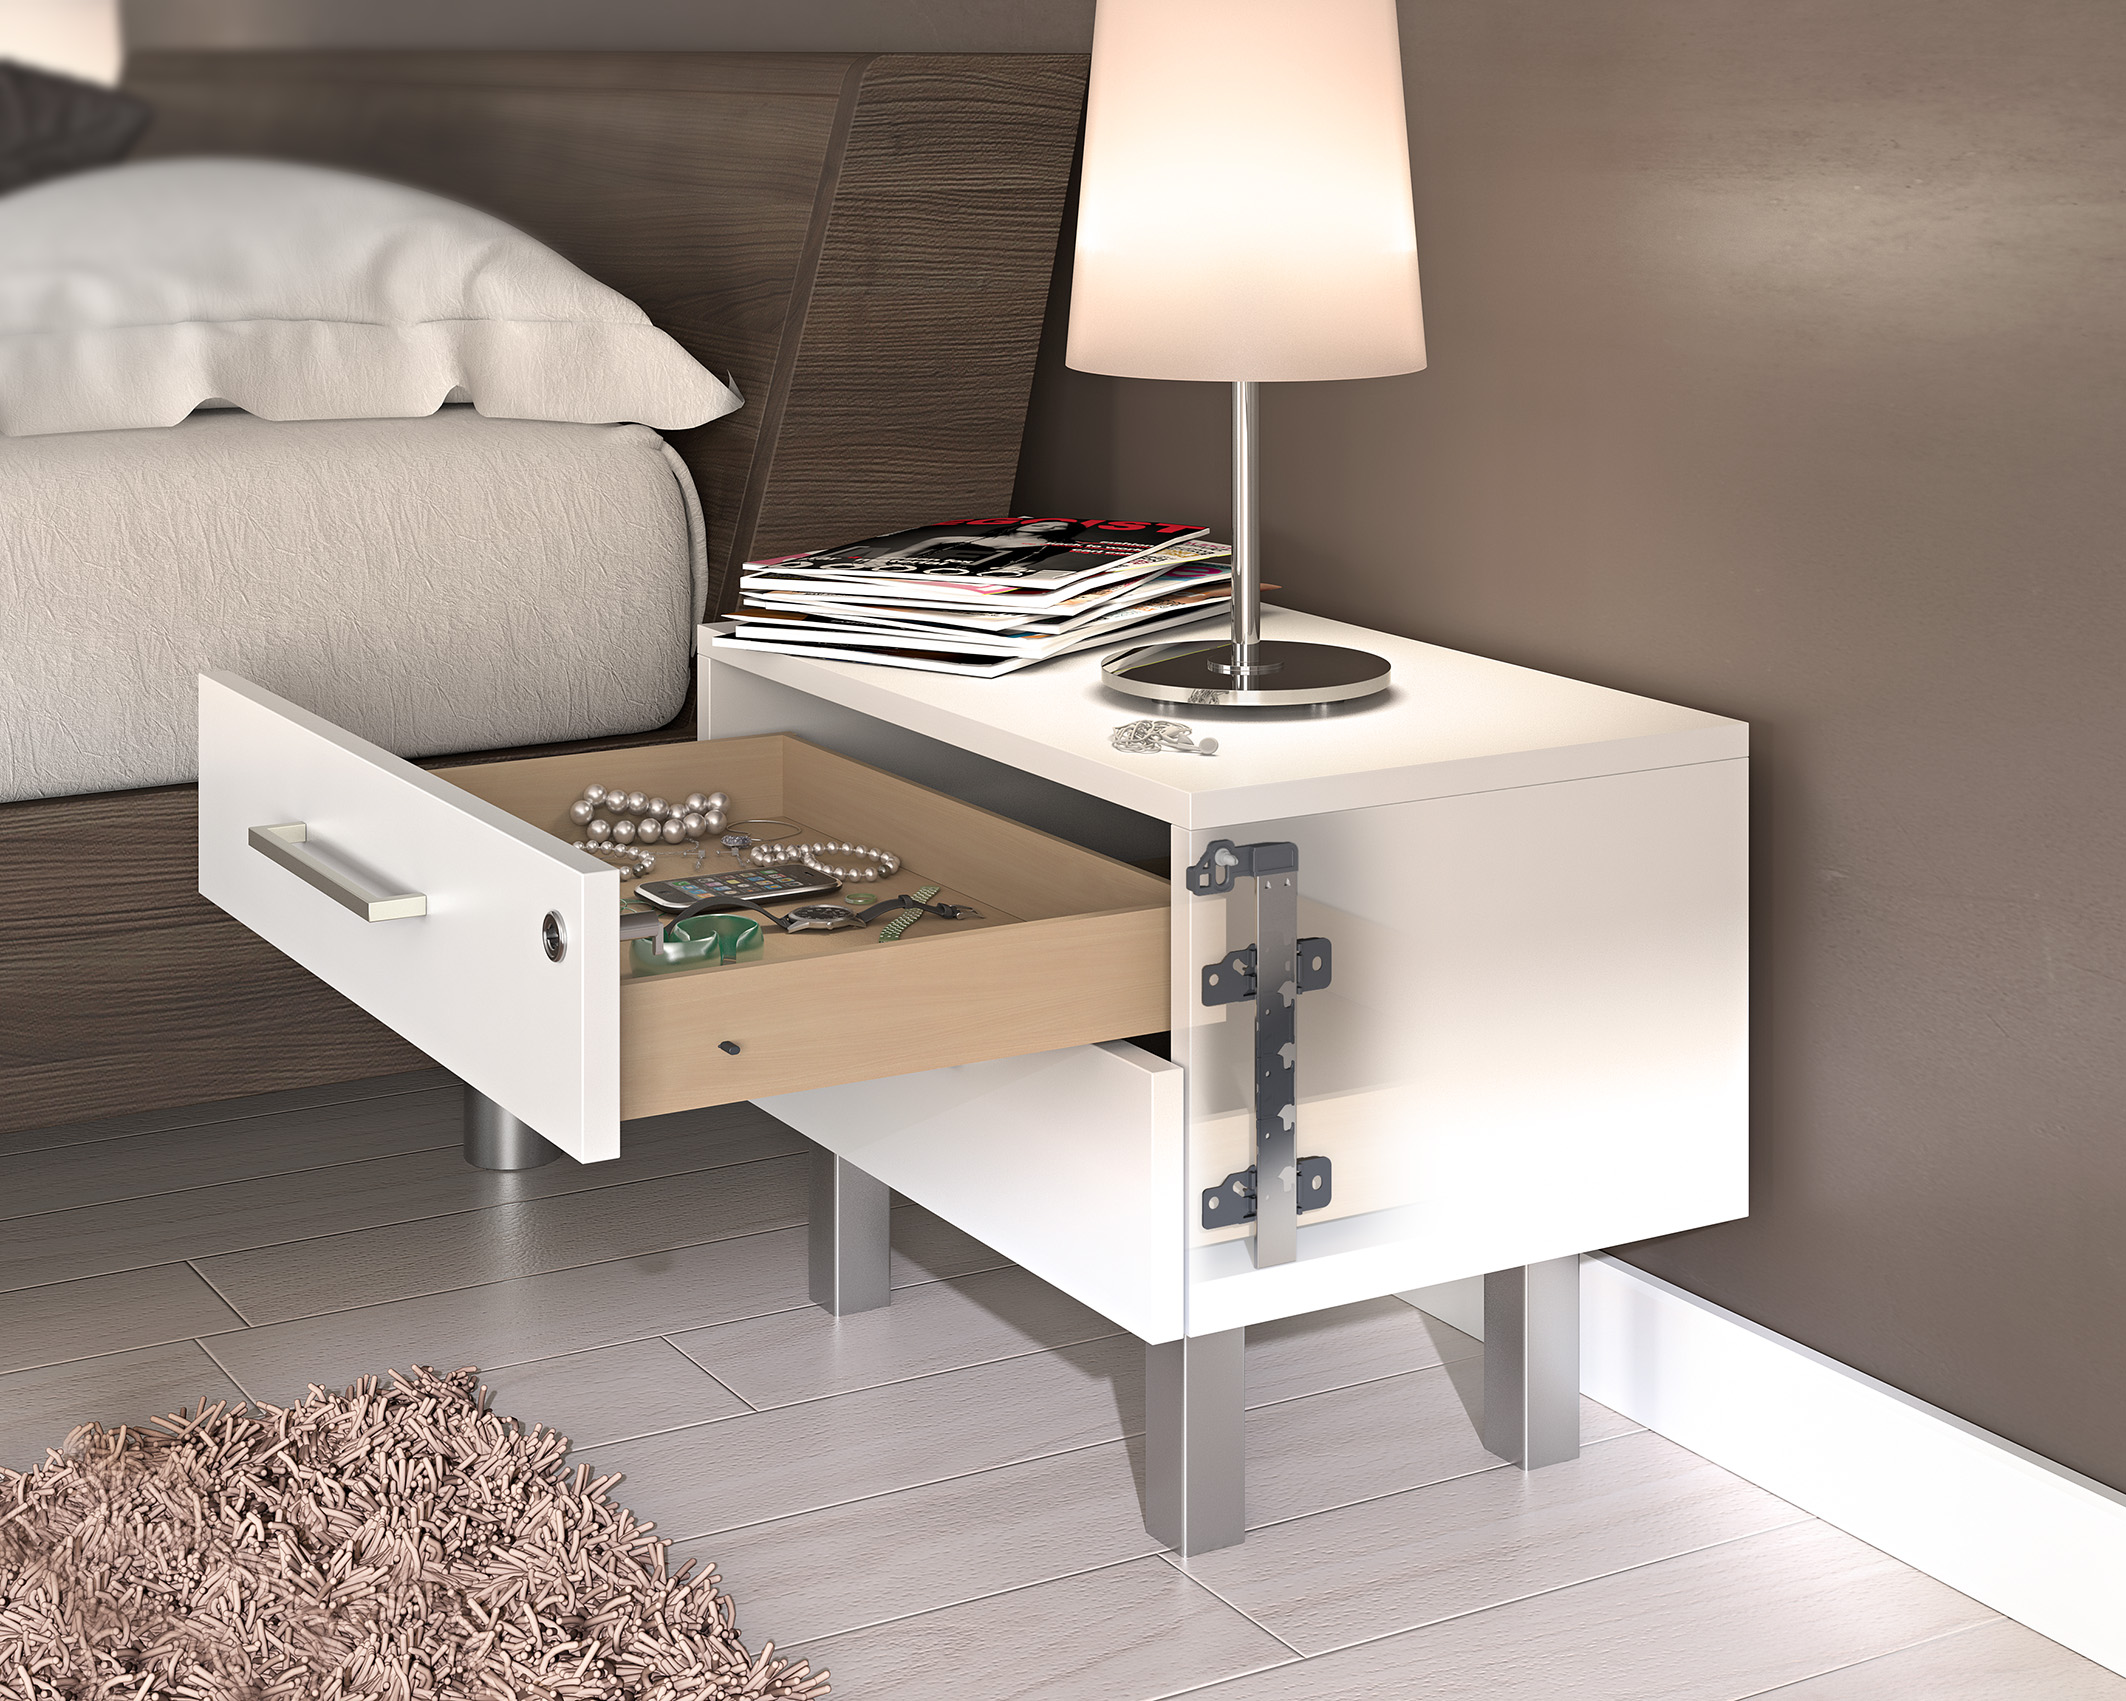 systeme f r b rom bel hettich. Black Bedroom Furniture Sets. Home Design Ideas